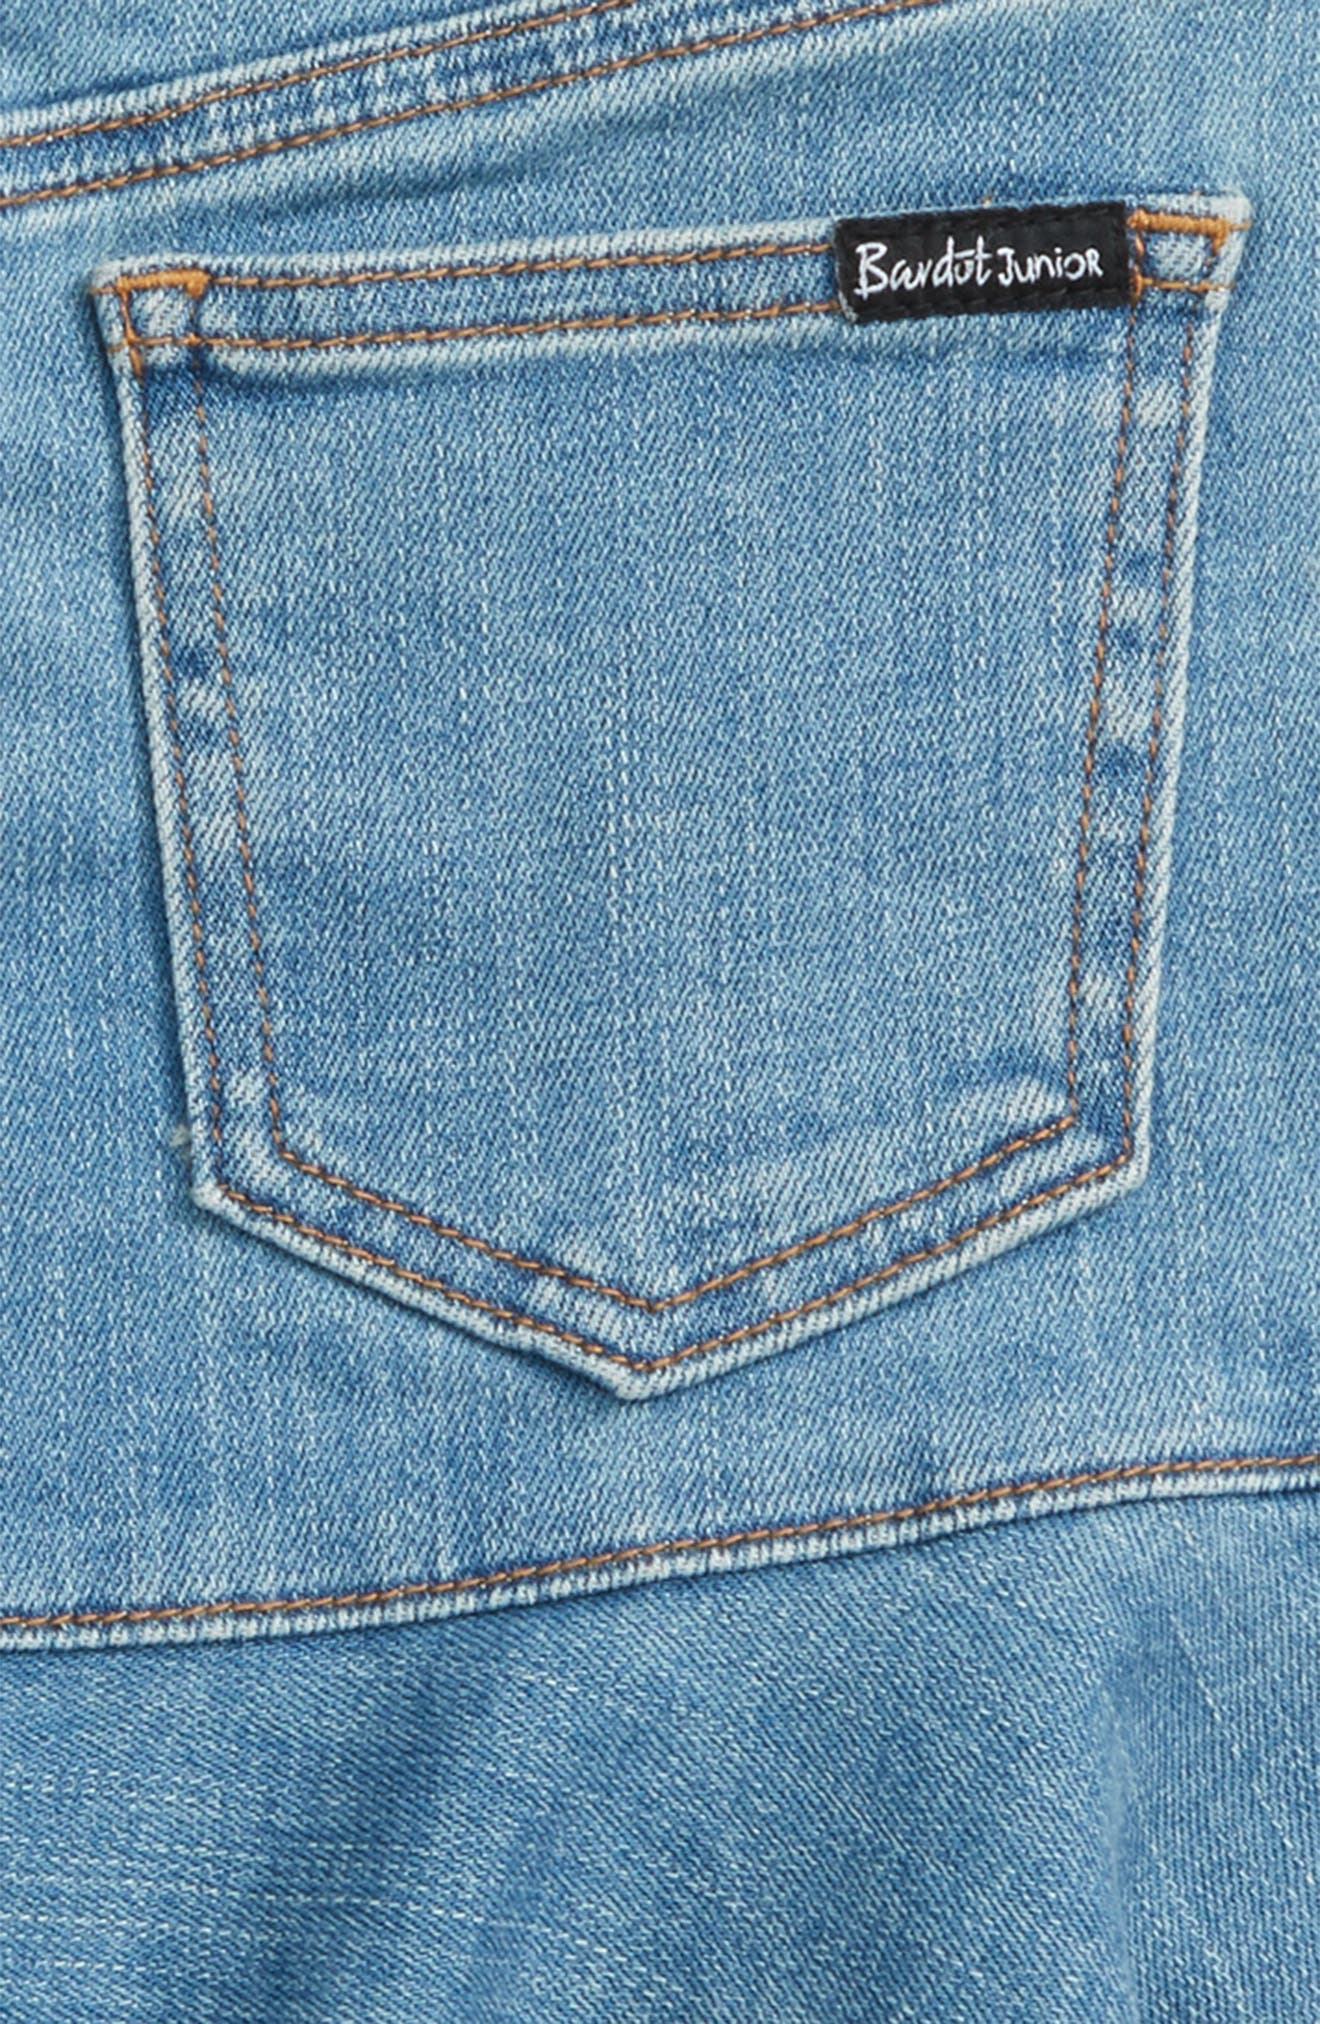 Mia Denim Skirt,                             Alternate thumbnail 3, color,                             Vintage Wash